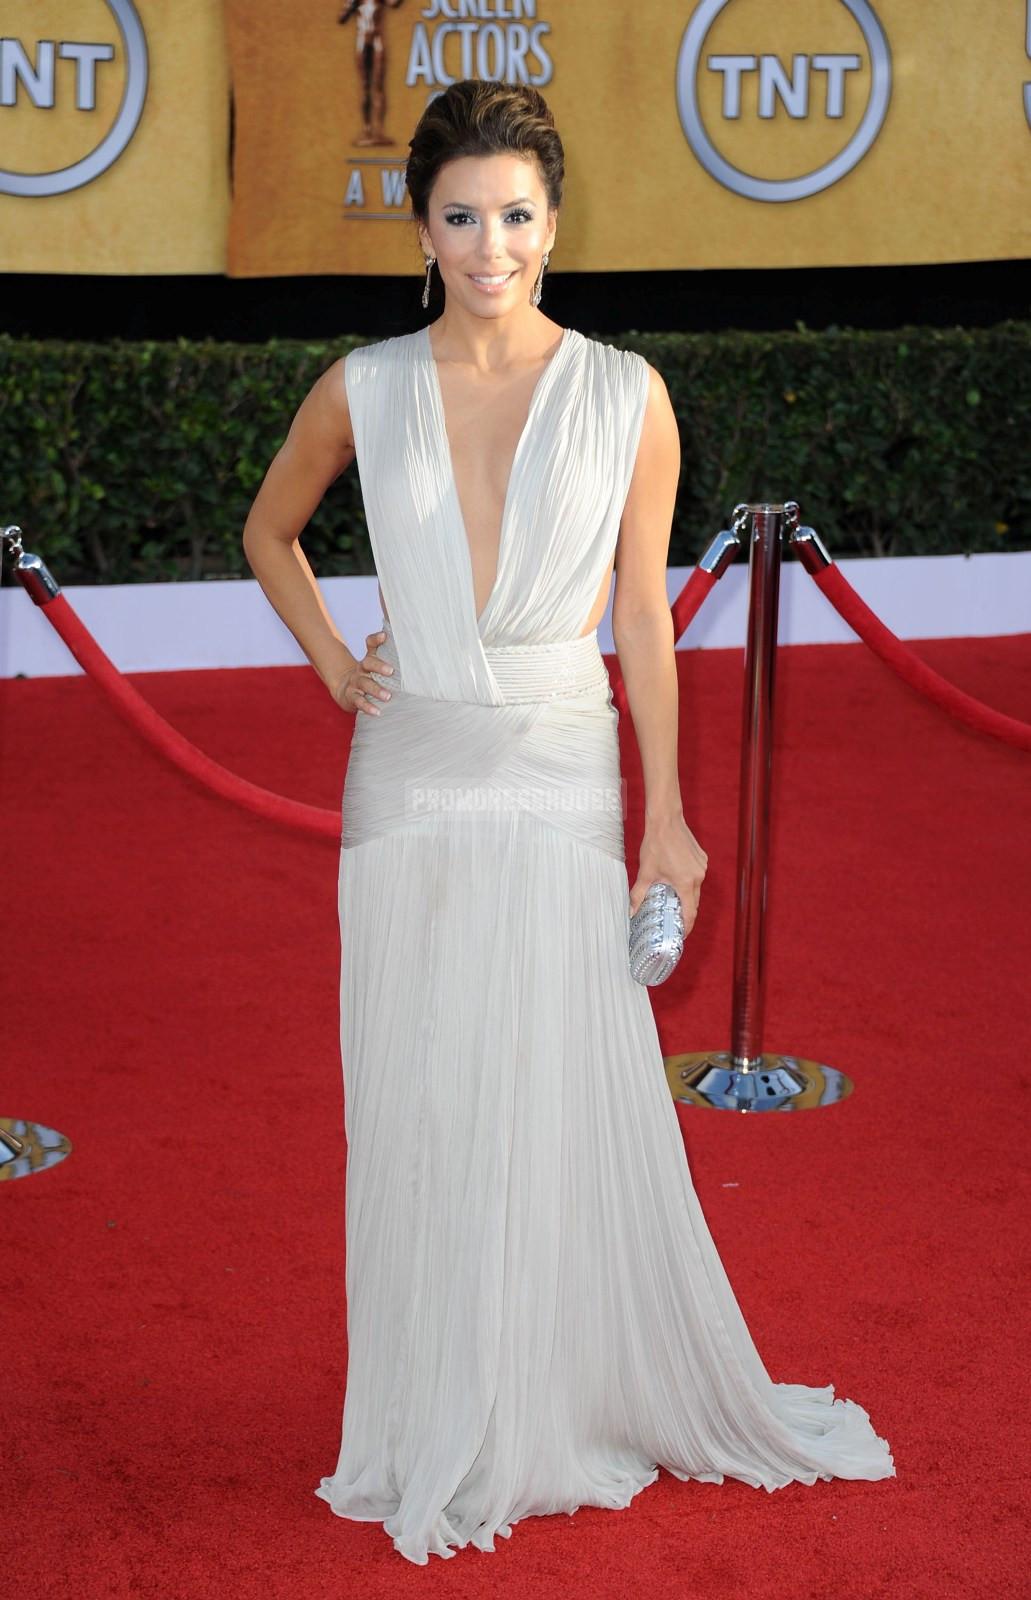 Ruched V-neck White A-line Chiffon Sweep Train Celebrity Dress - Promdresshouse.com